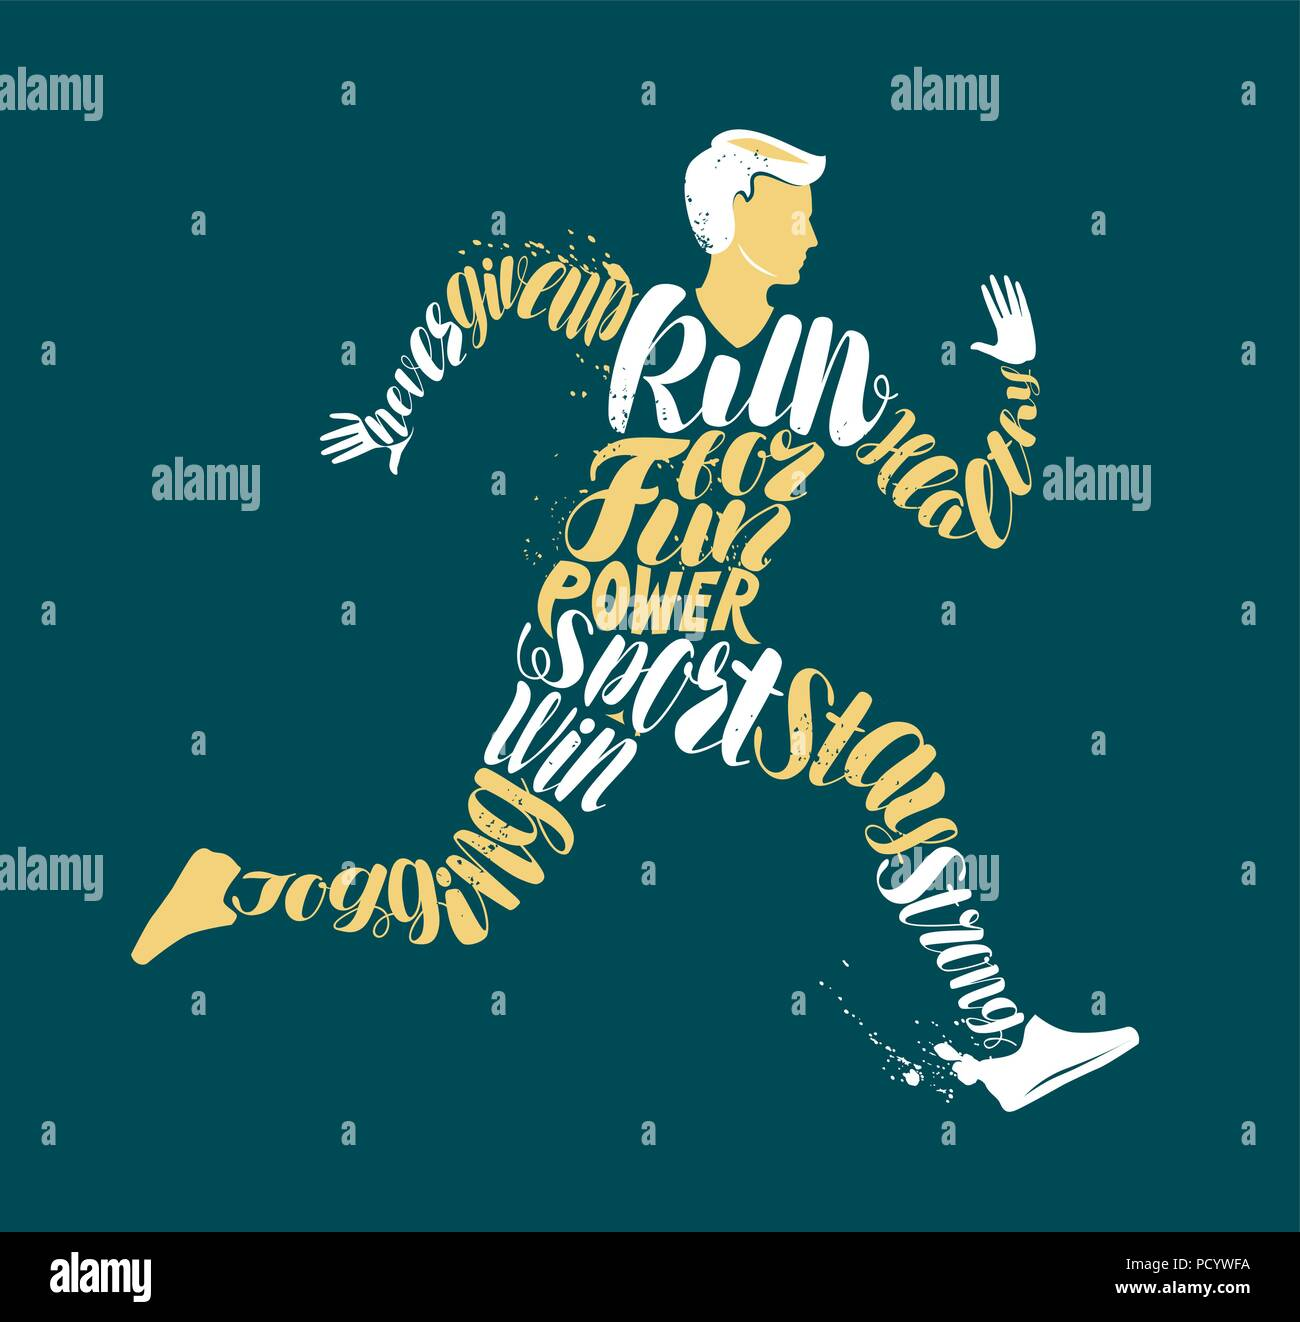 Jogging, fitness or run concept. Typographic design, vector illustration - Stock Image